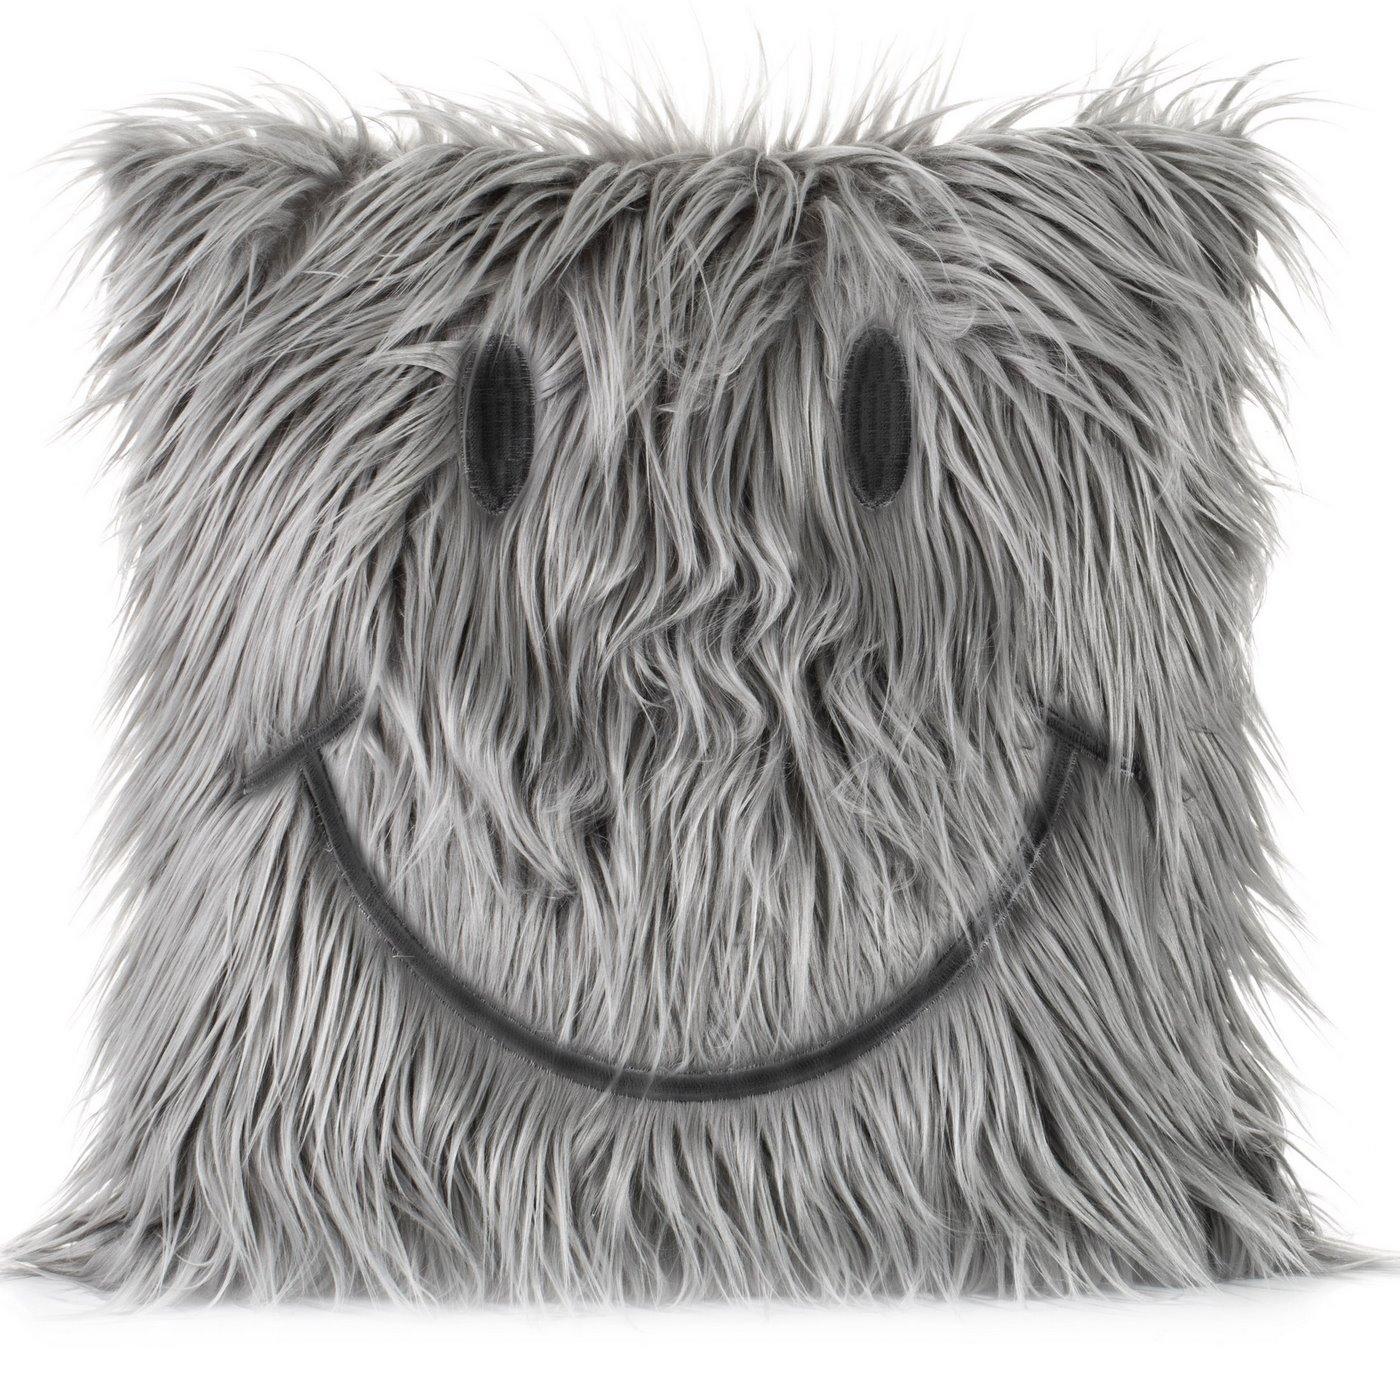 Poszewka na poduszkę futerko uśmiech 45 x 45 cm szara